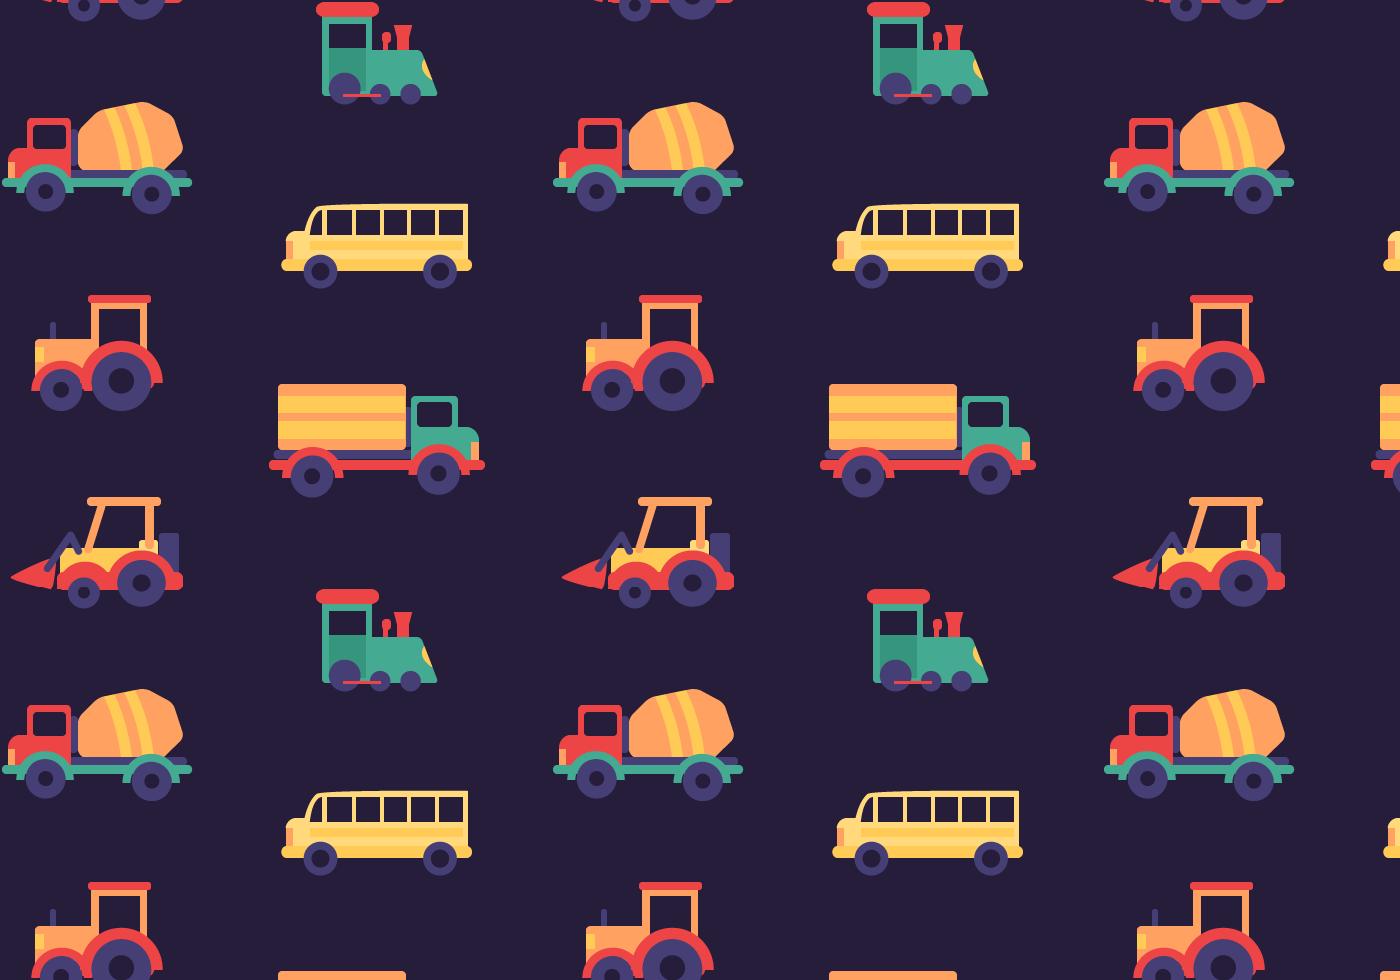 free car pattern vector download free vector art stock graphics images. Black Bedroom Furniture Sets. Home Design Ideas